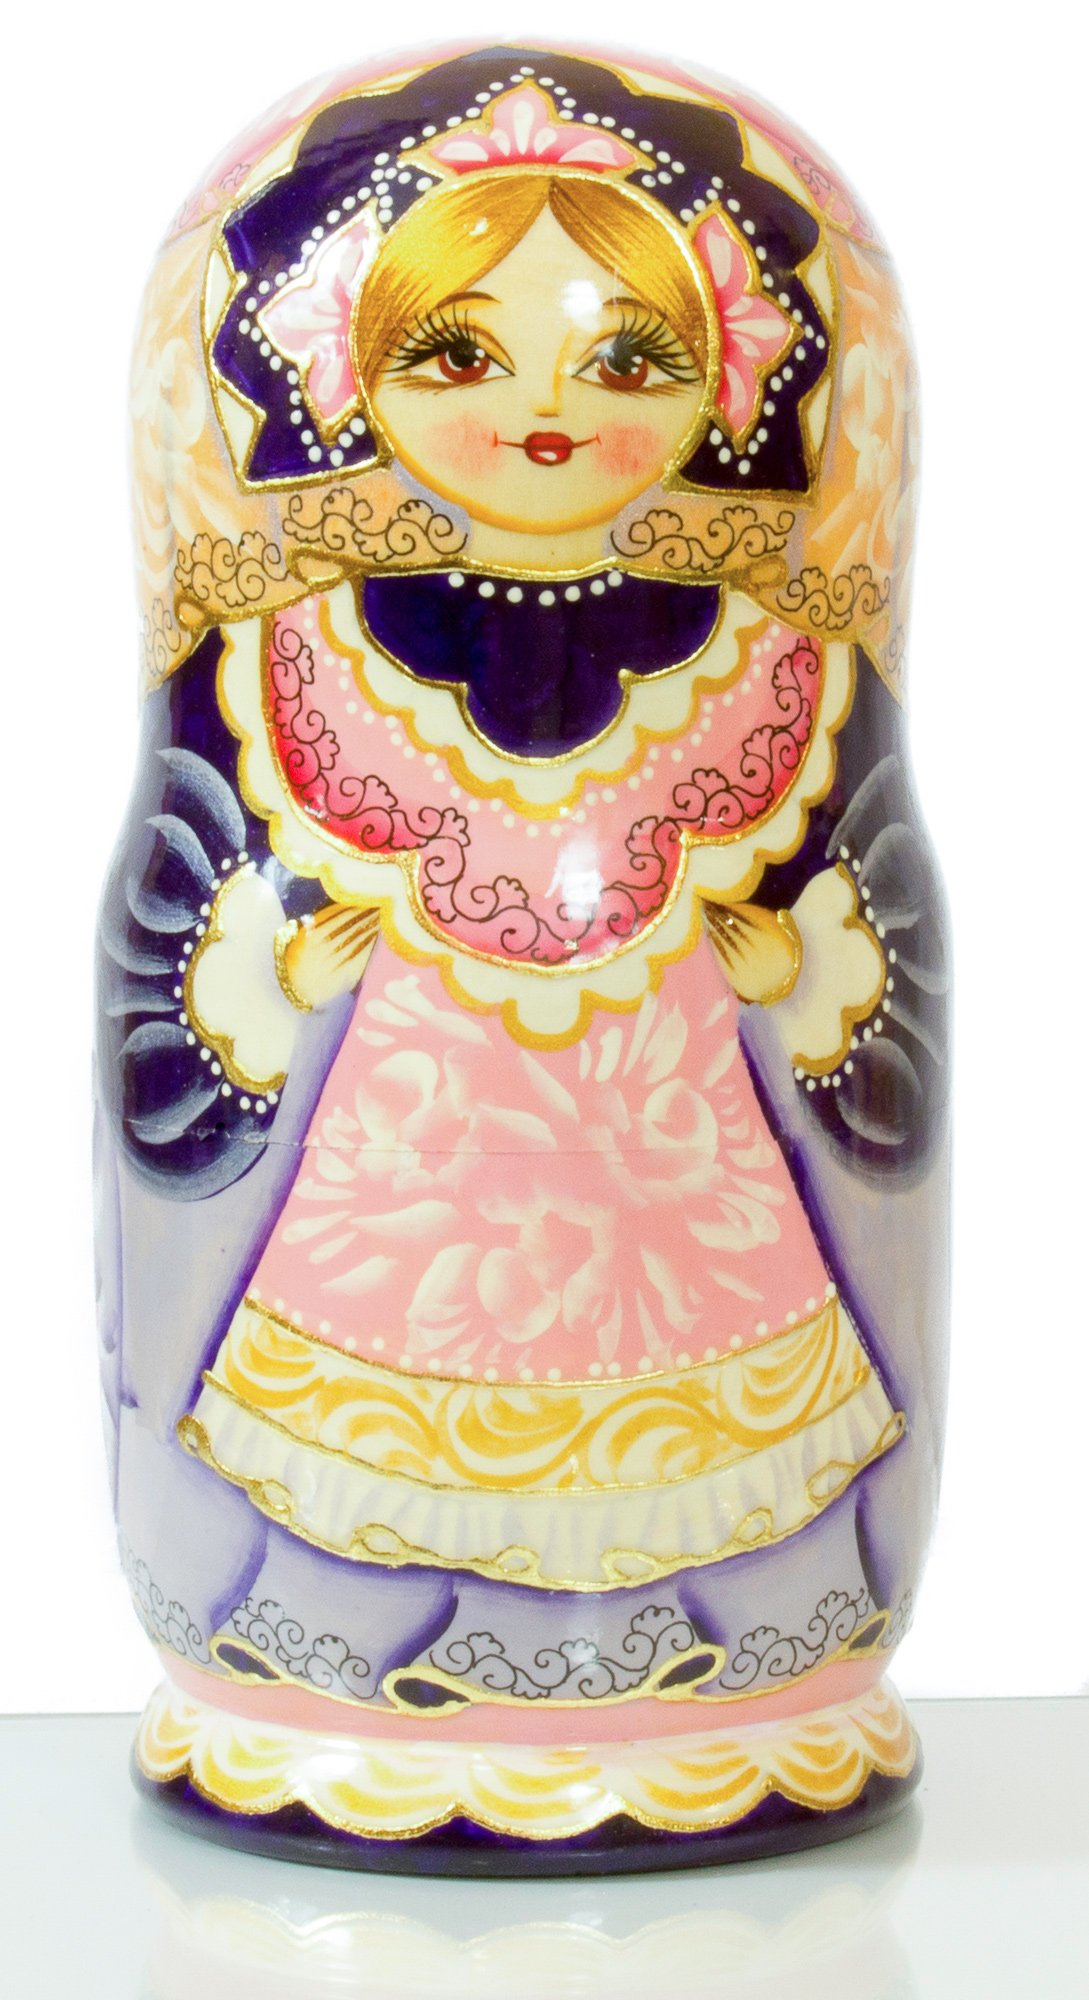 Russian Nesting Doll - Hand Painted in Russia -- BIG SIZE - ''Schoolgirl''- Traditional Matryoshka Babushka (8.25``(7 dolls in1), Style:Schoolgirl)